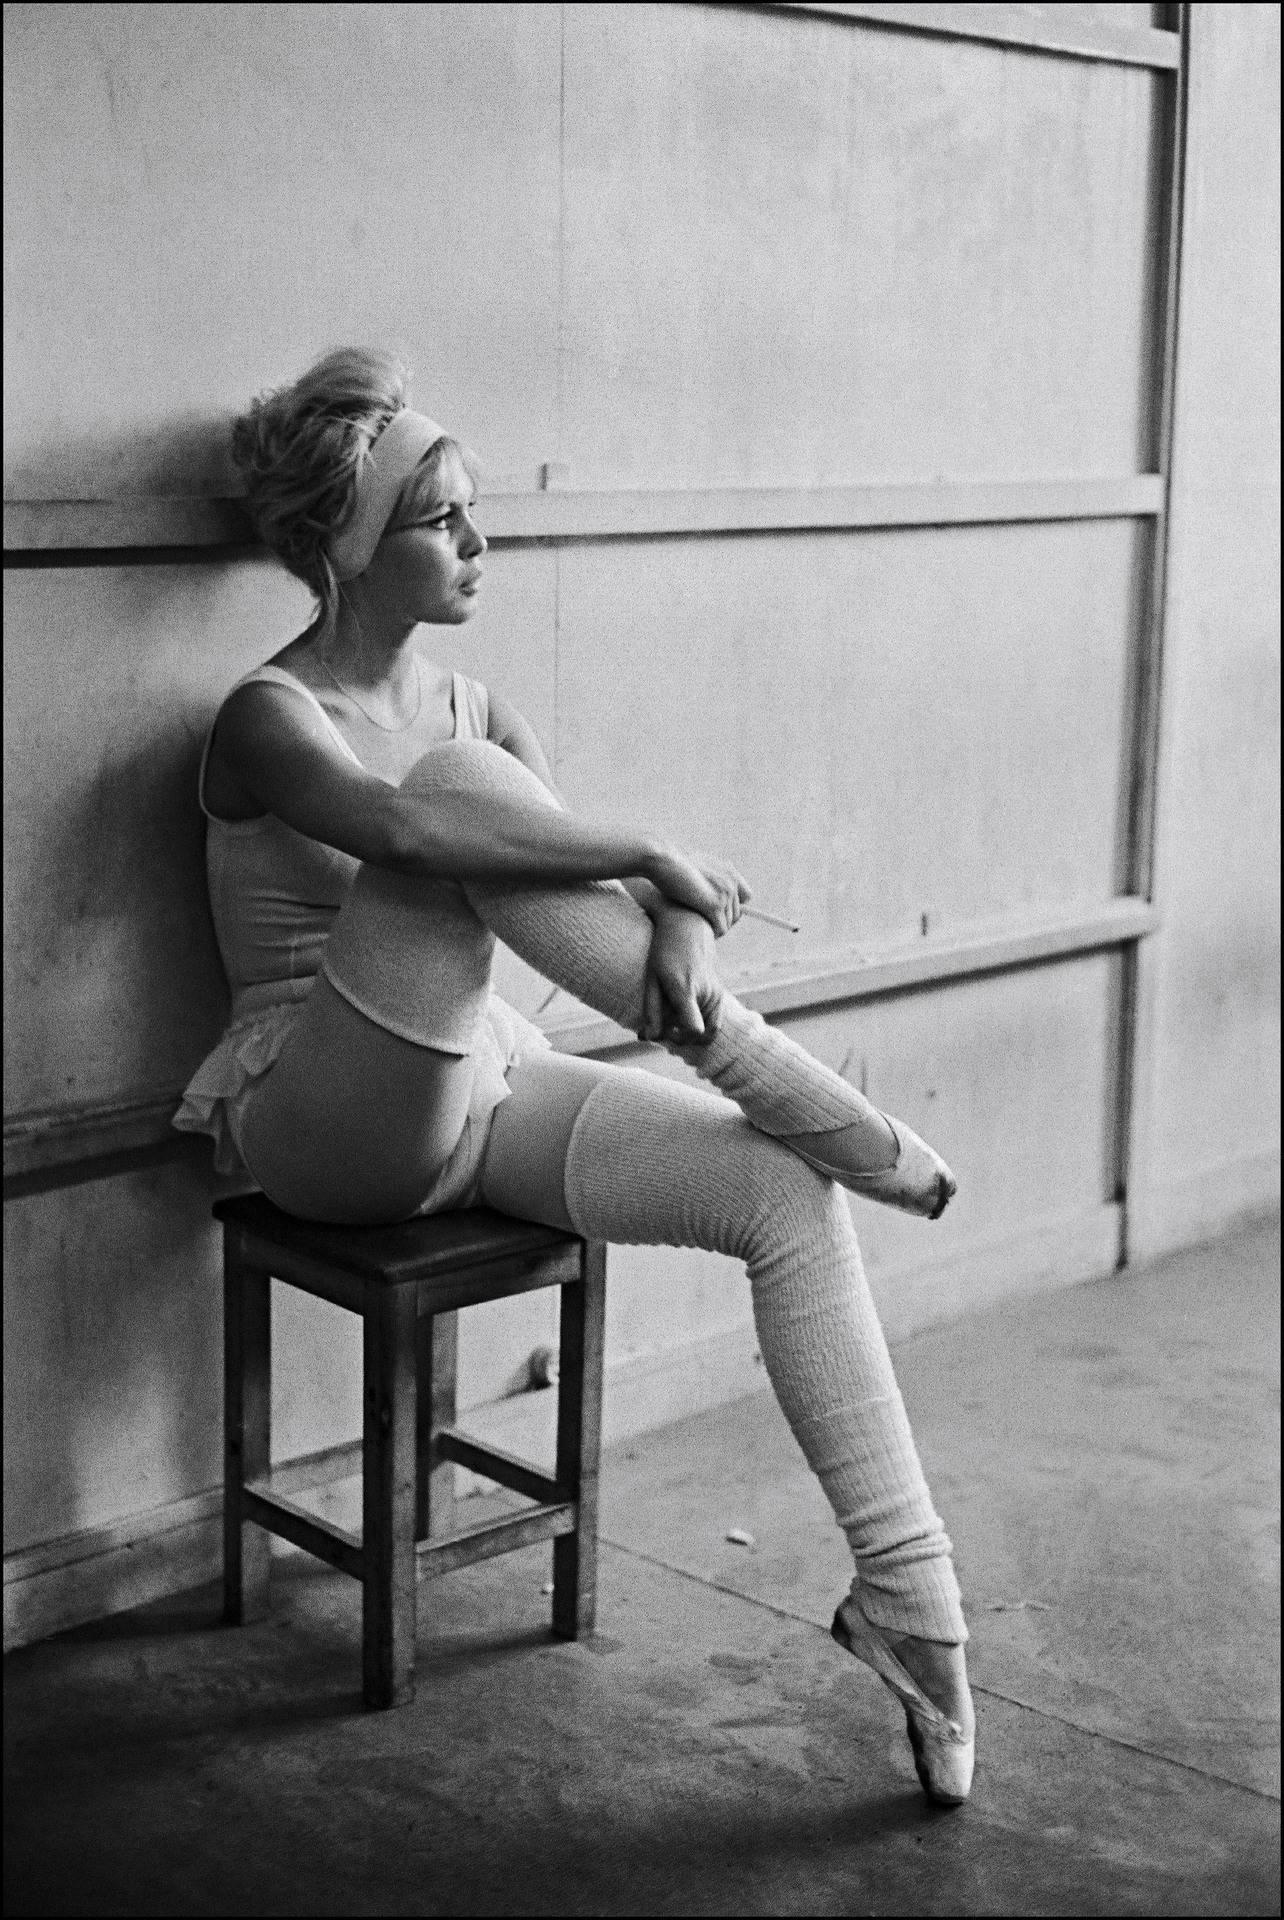 'Private Dancer' Brigitte Bardot 20th century black and white photography